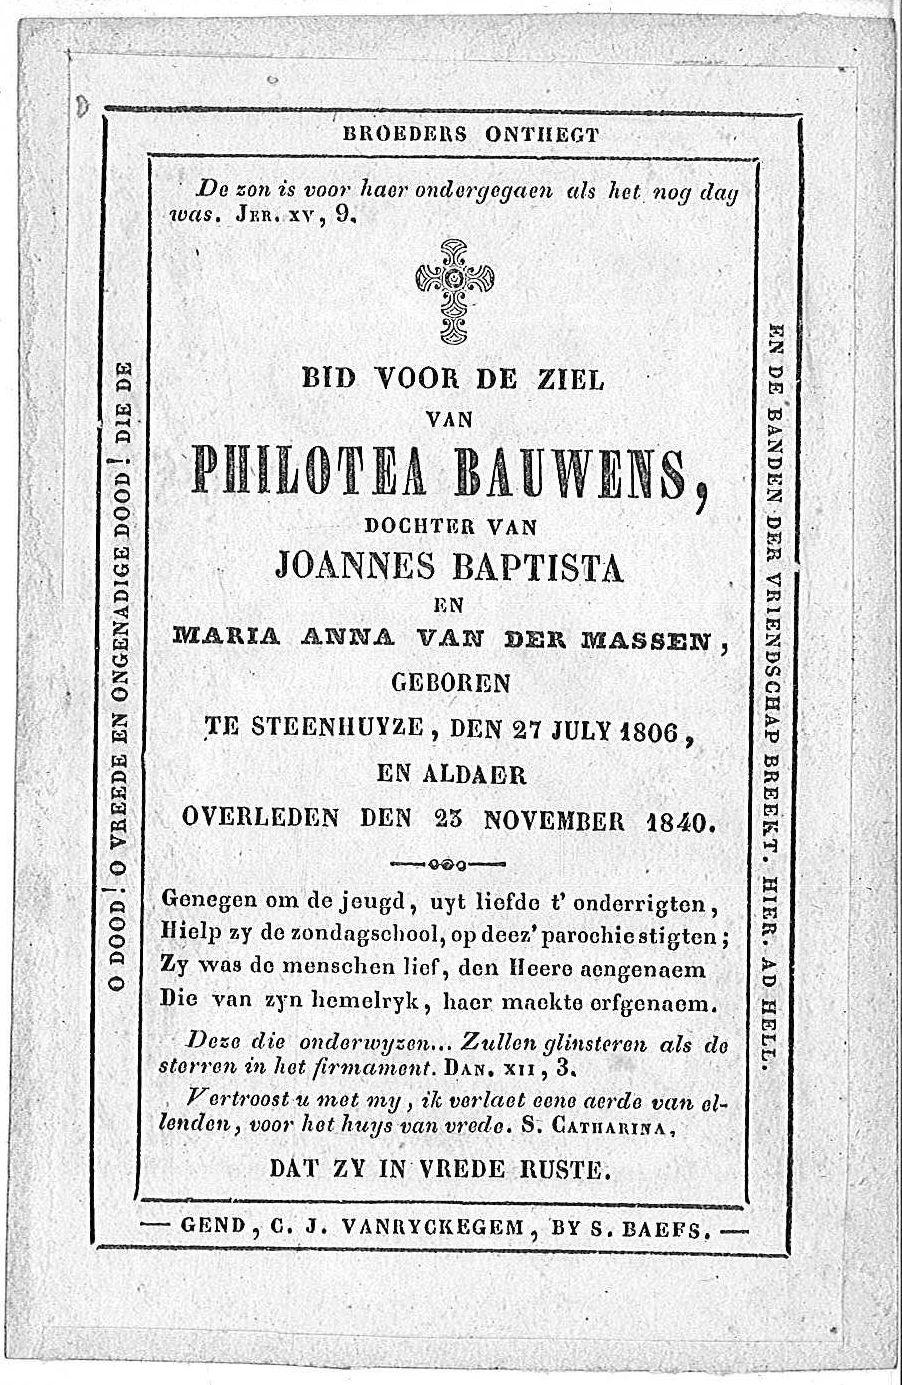 Philotea Bauwens